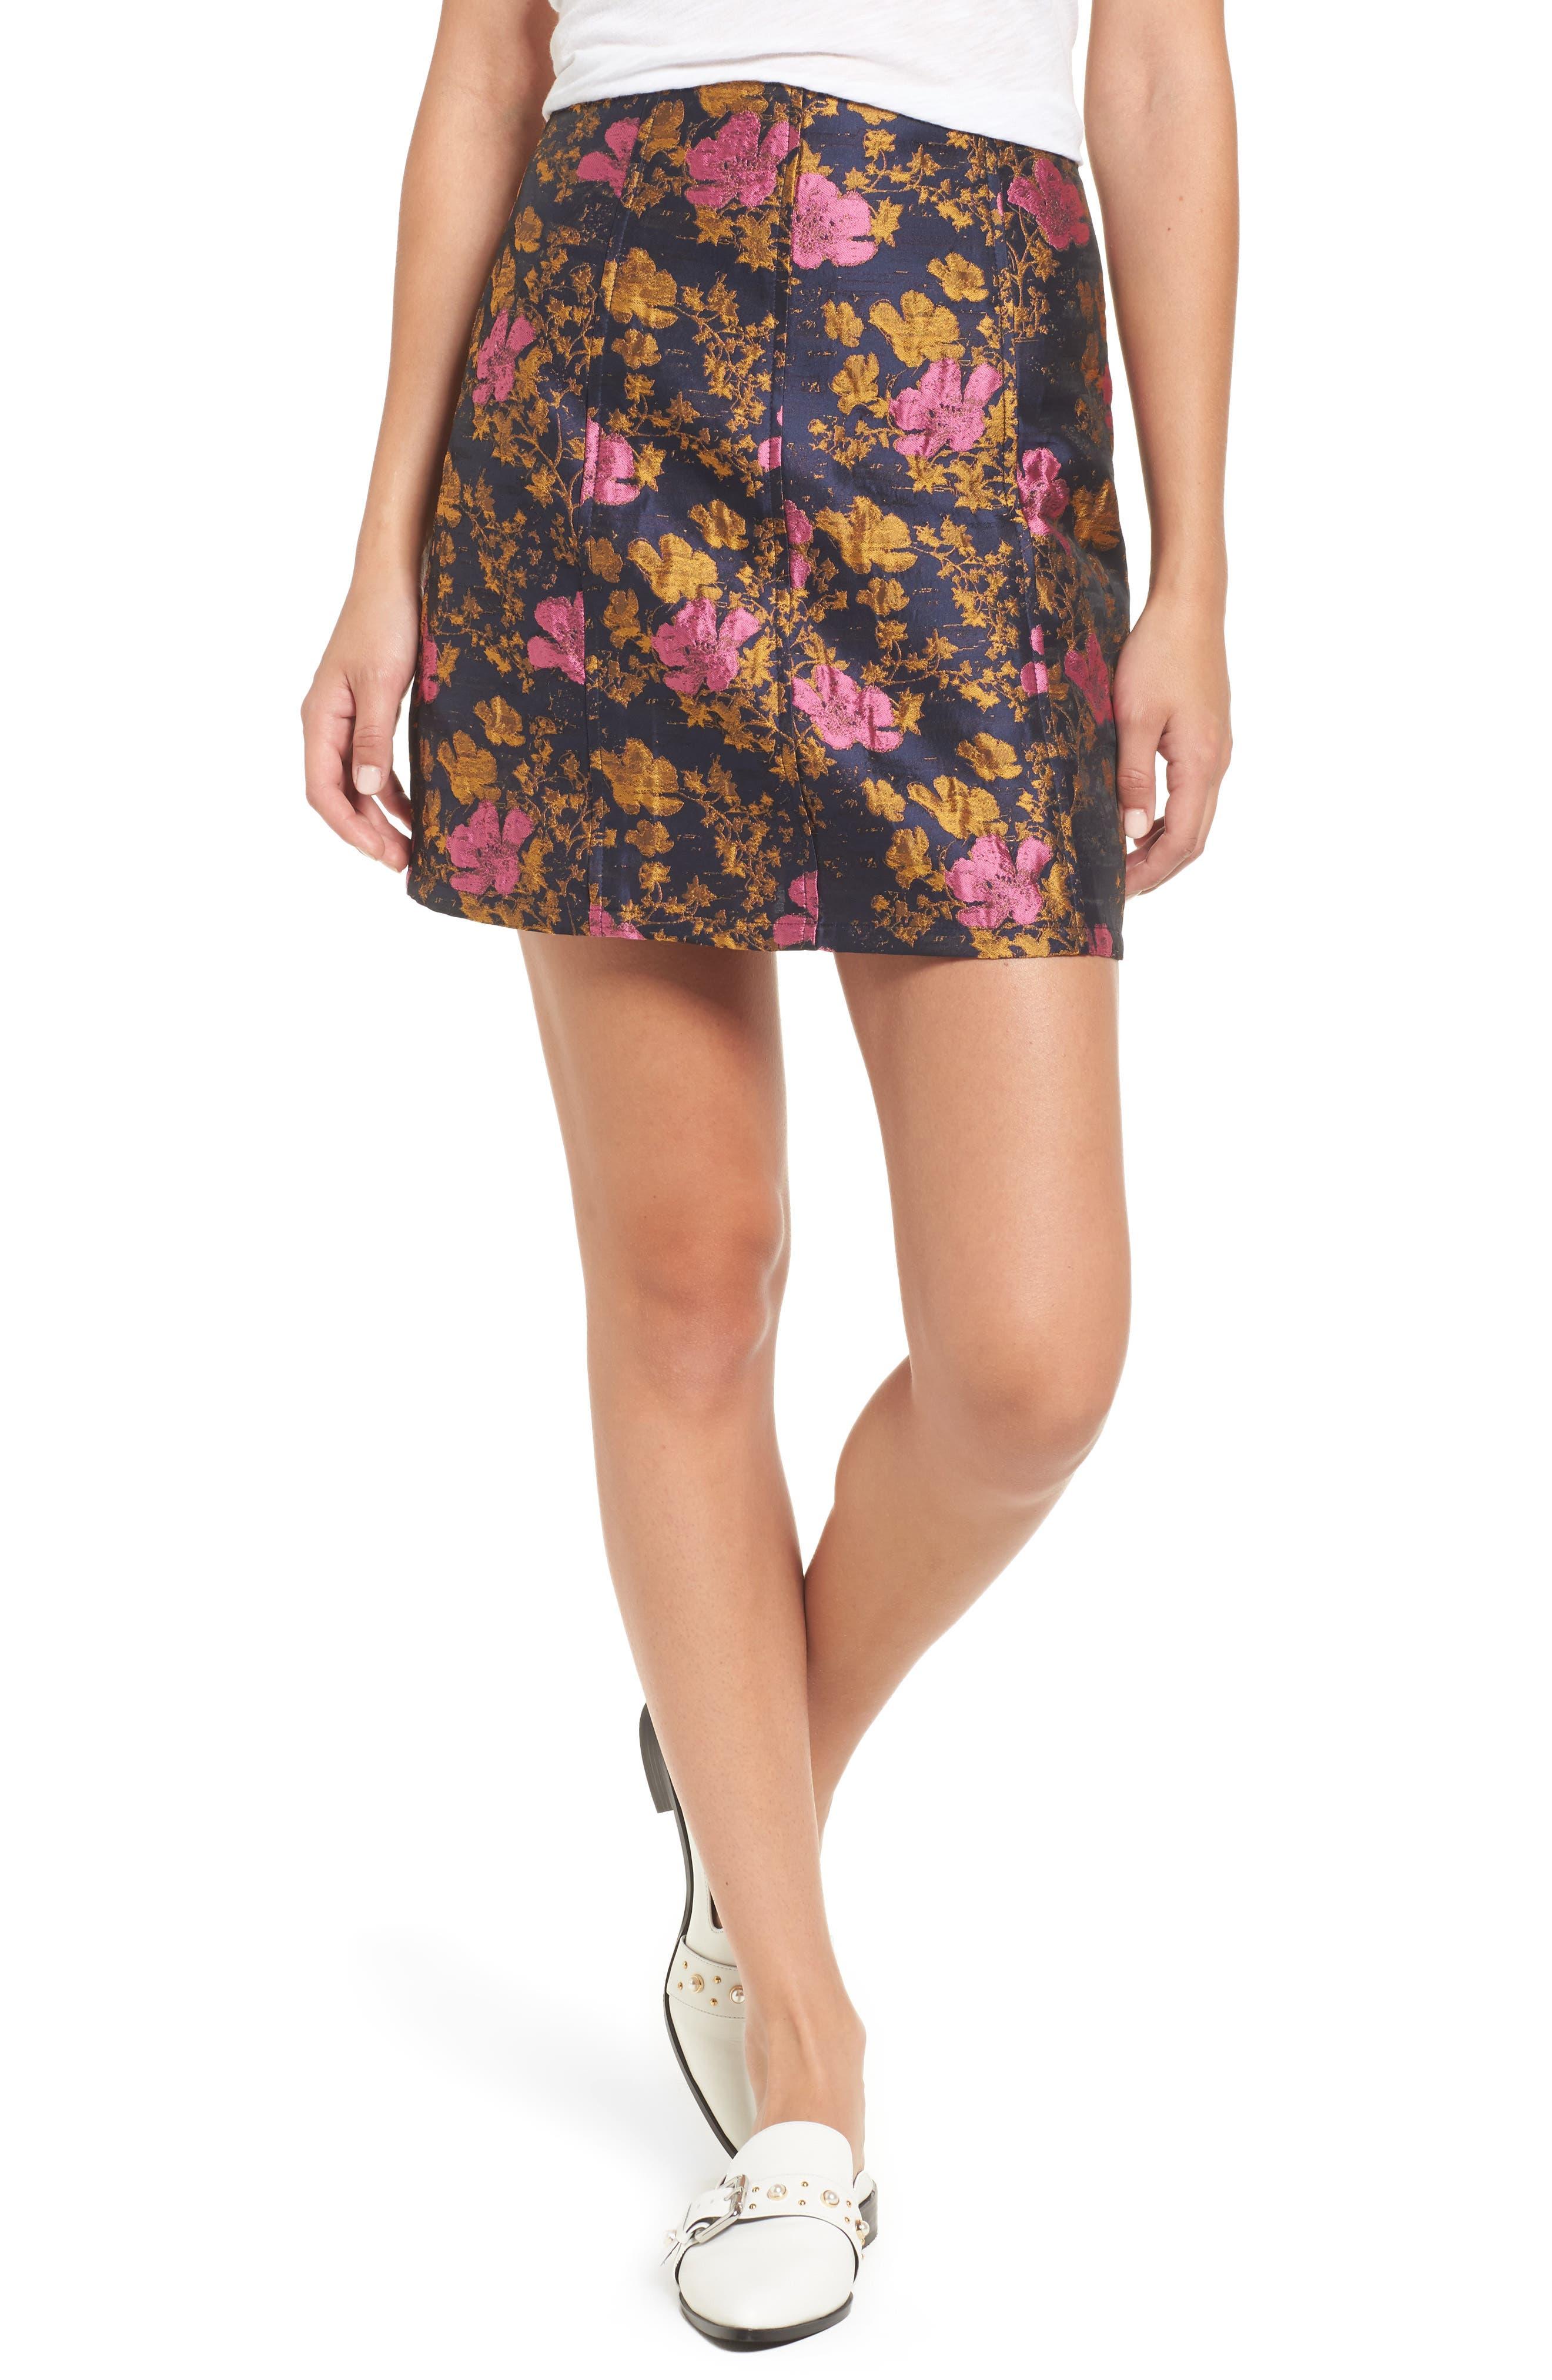 Alternate Image 1 Selected - Leith High Waist Floral Print Miniskirt